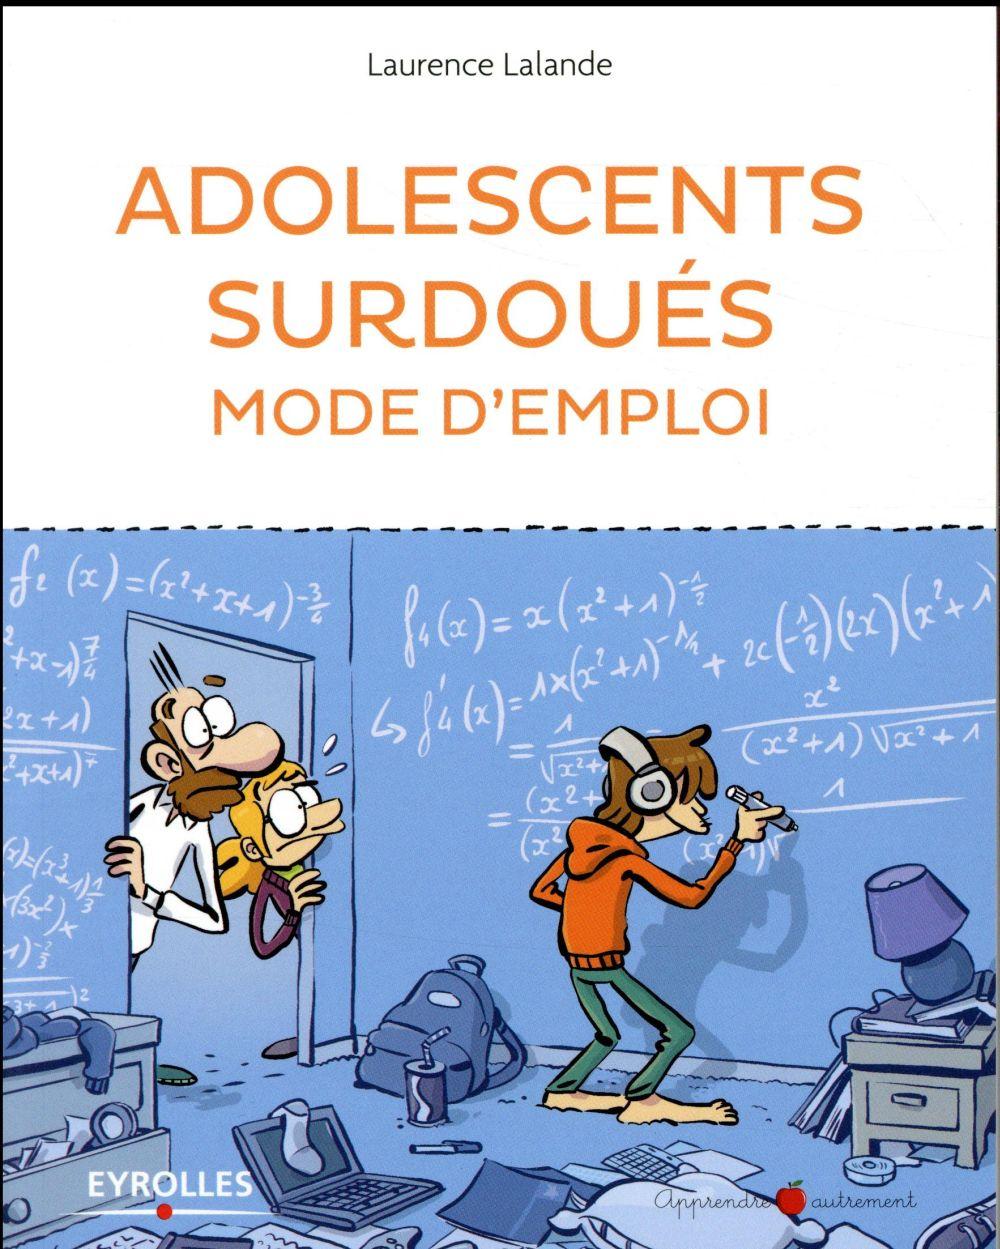 Adolescents surdoués mode d'emploi